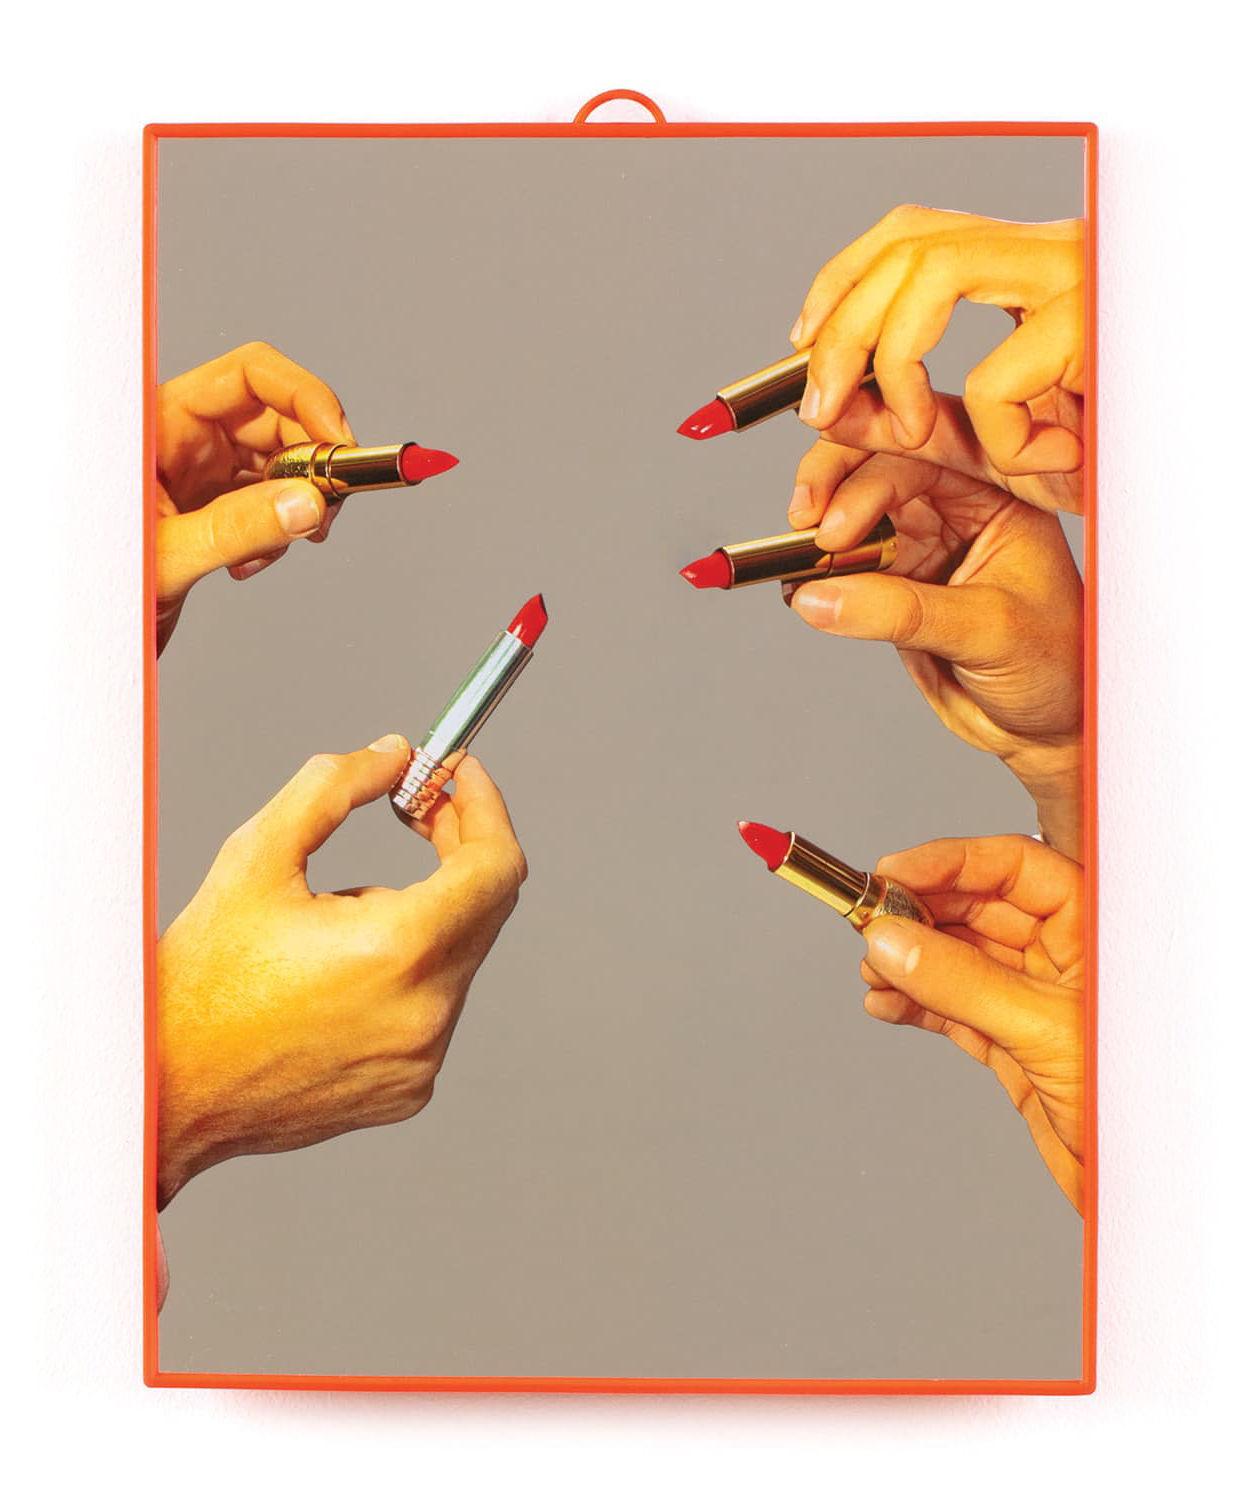 Dekoration - Spiegel - Toiletpaper Spiegel / Lipsticks - Medium H 30 cm - Seletti - lippenstift / Orange - Plastikmaterial, Verre sérigraphié